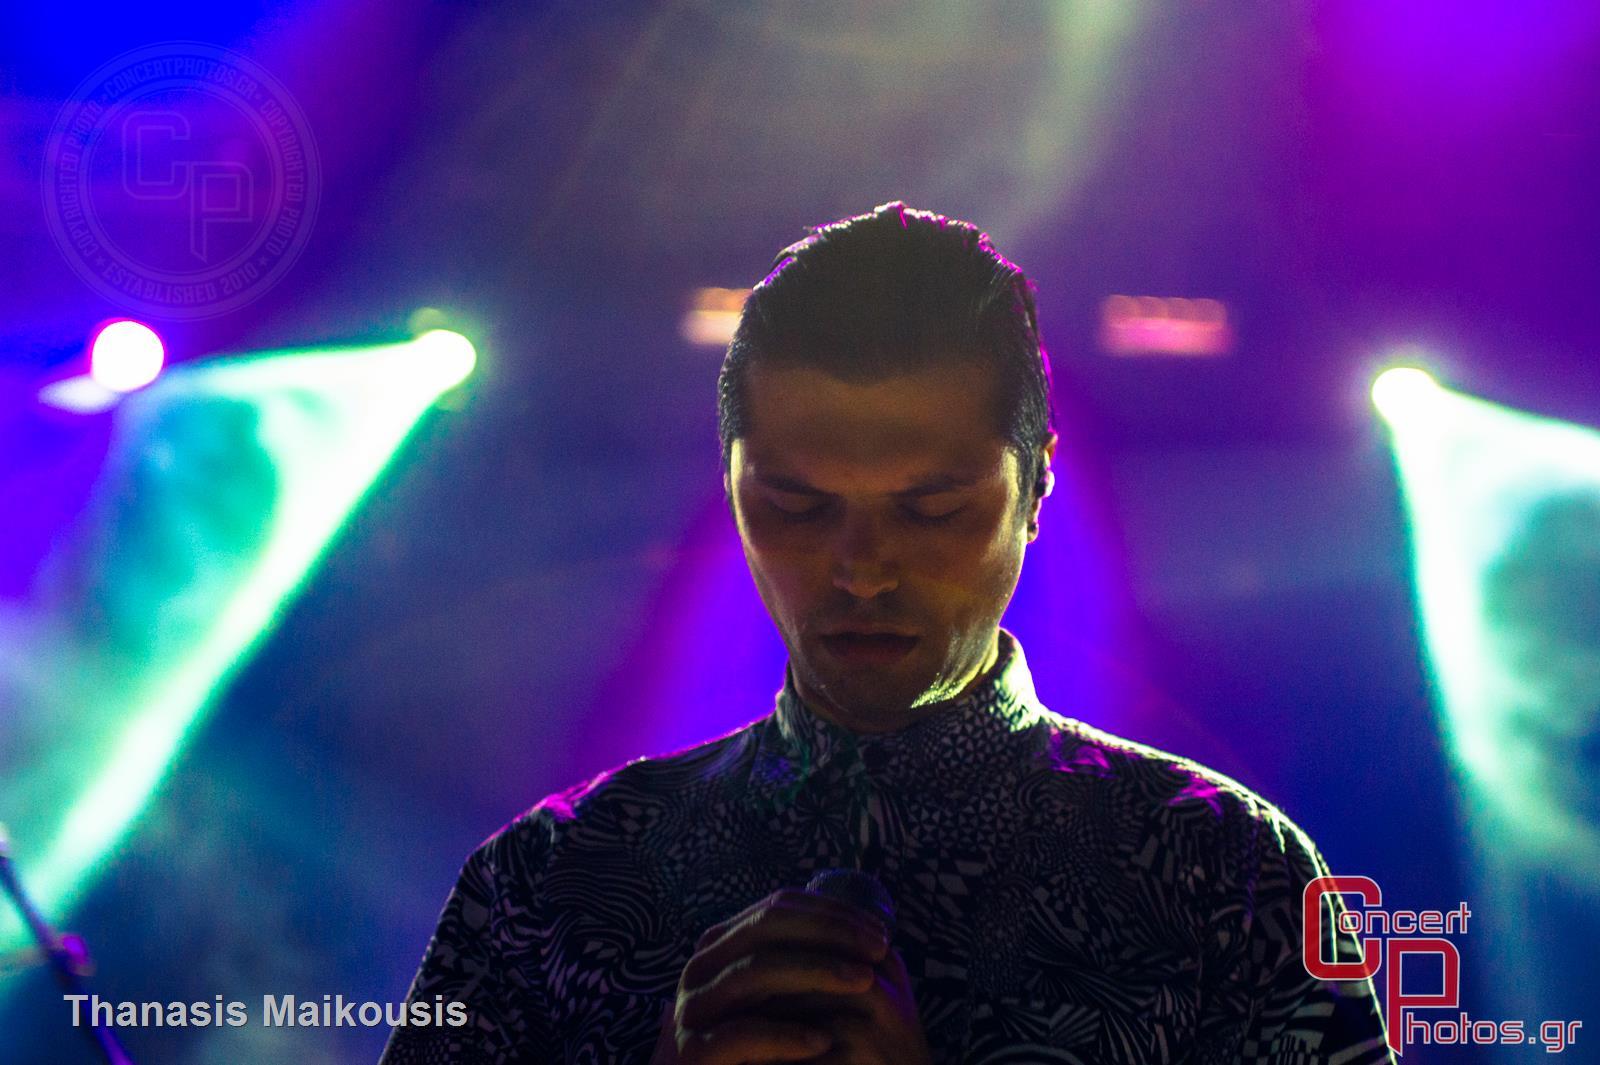 Tricky - Spectralfire-Tricky - Spectralfire photographer: Thanasis Maikousis - concertphotos_-3507